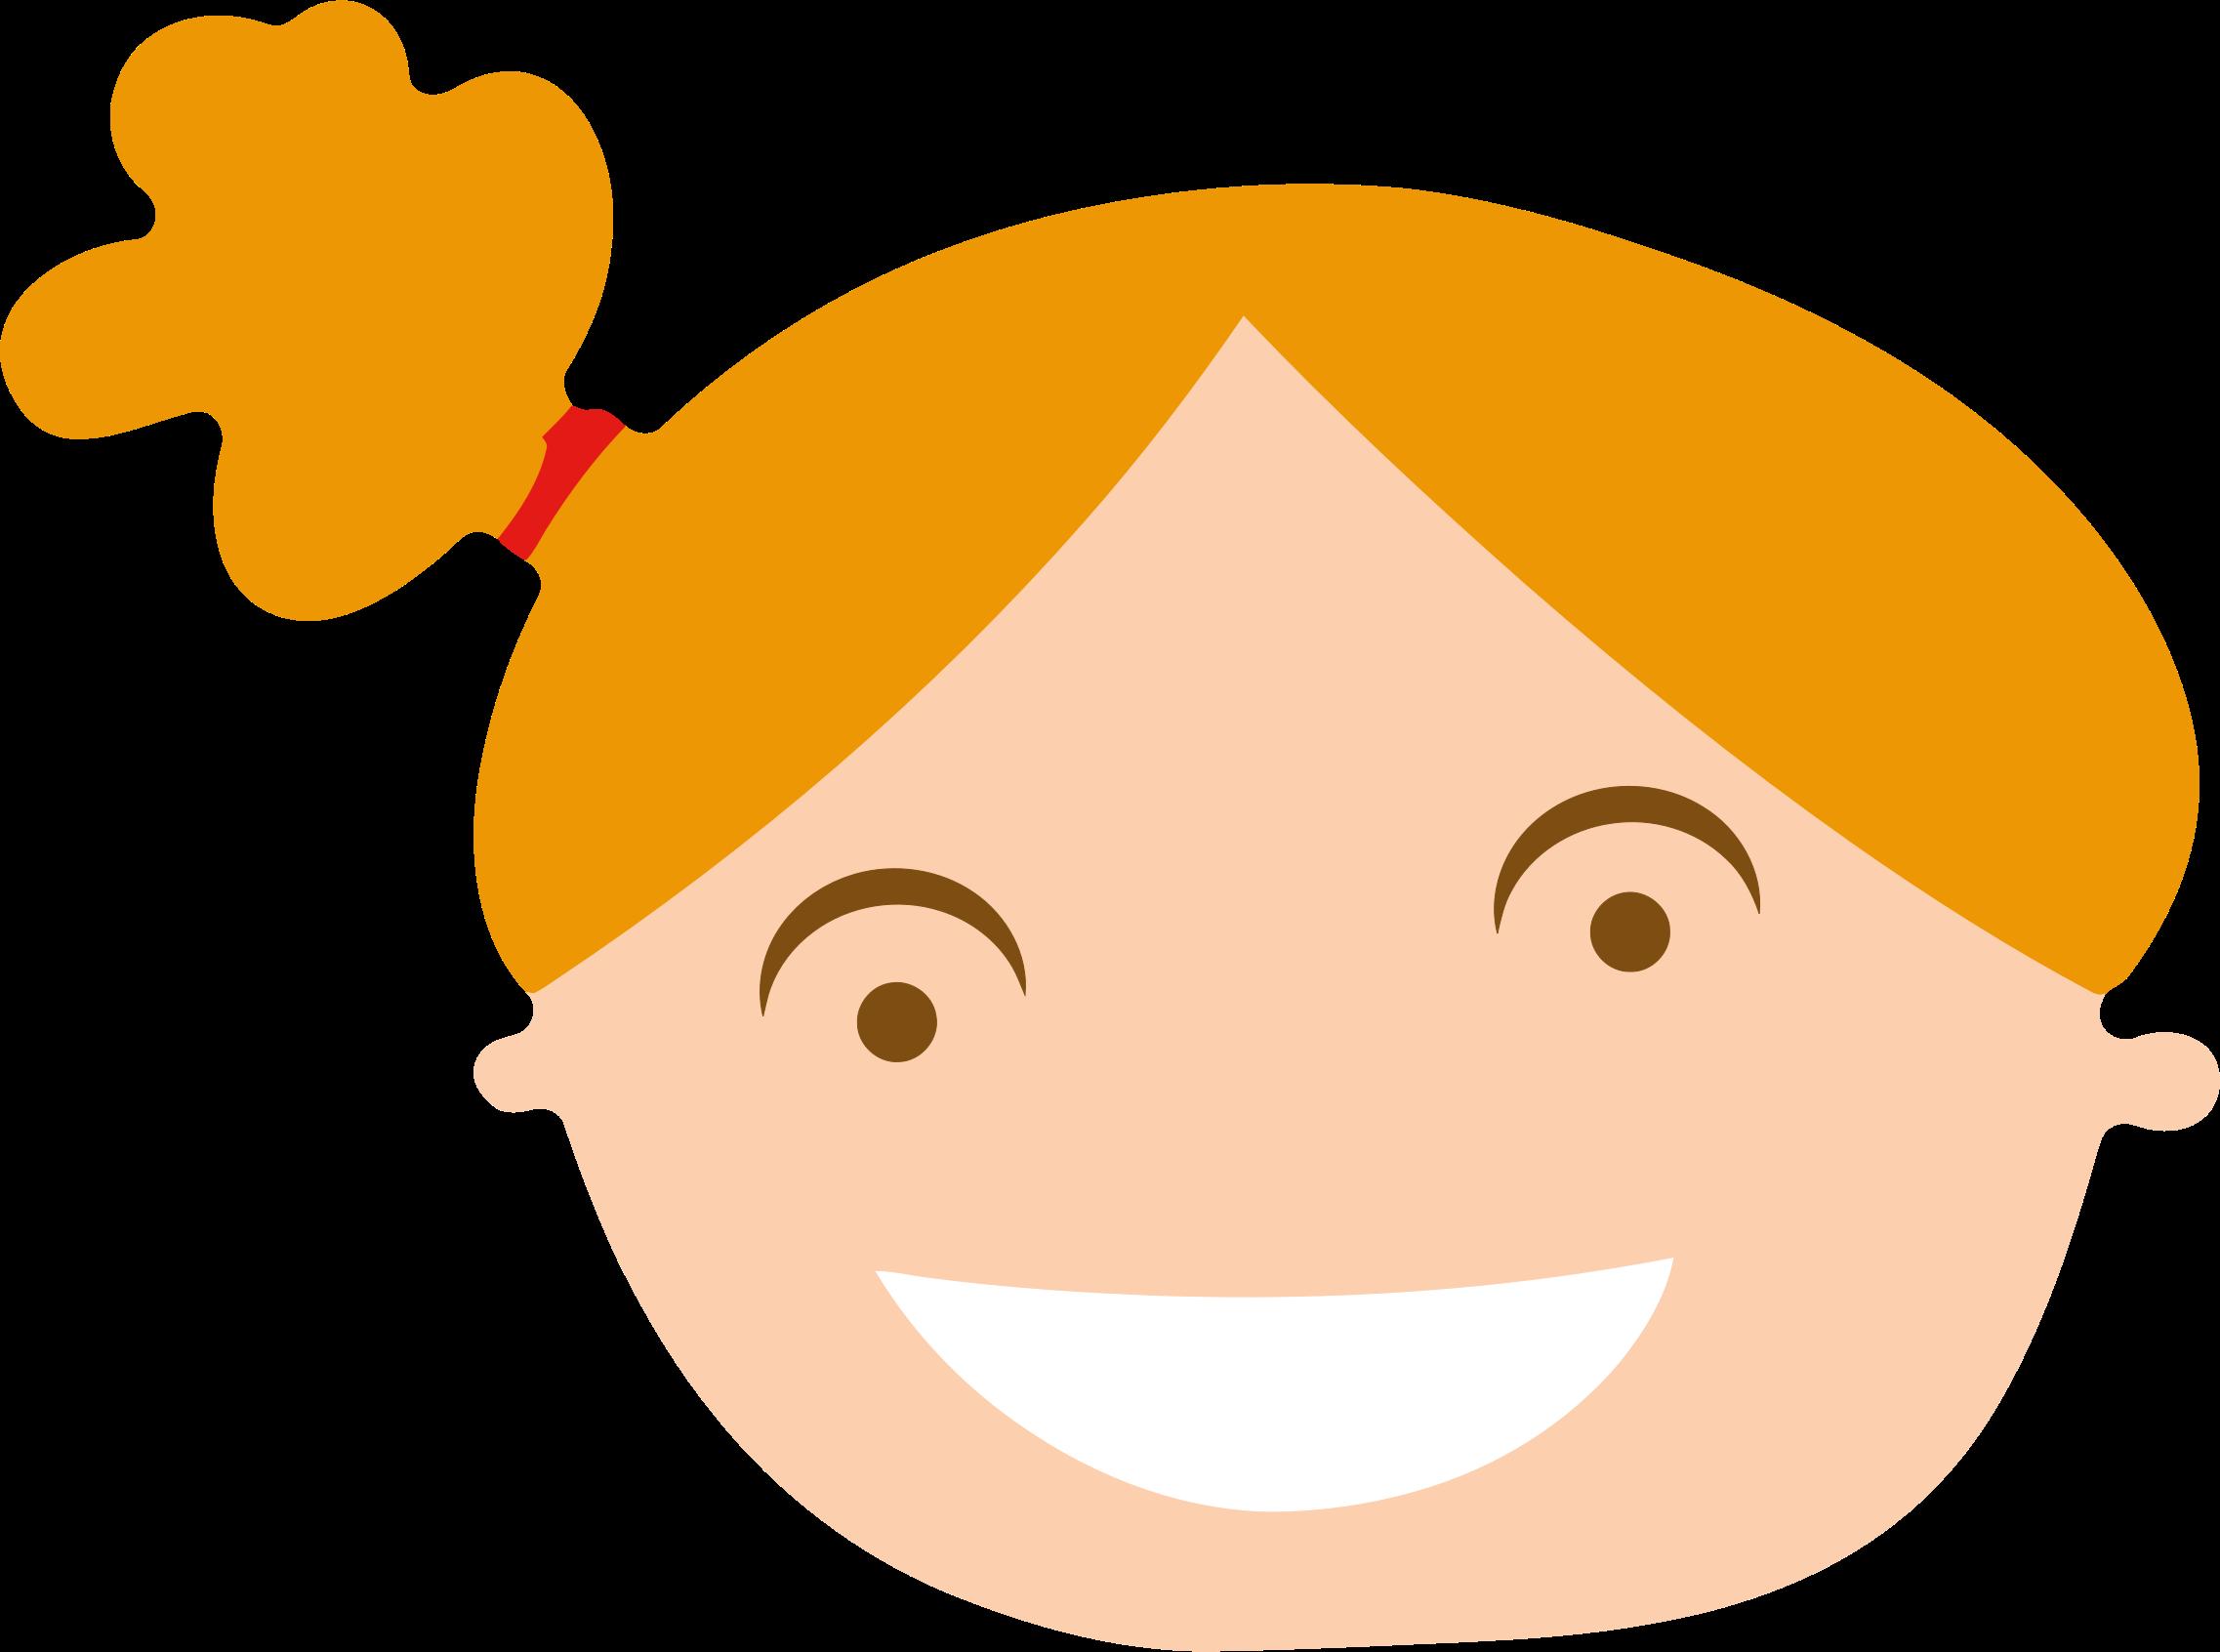 Transparent clipart frau - Funny Nose Clipart - Girl Head Clipart